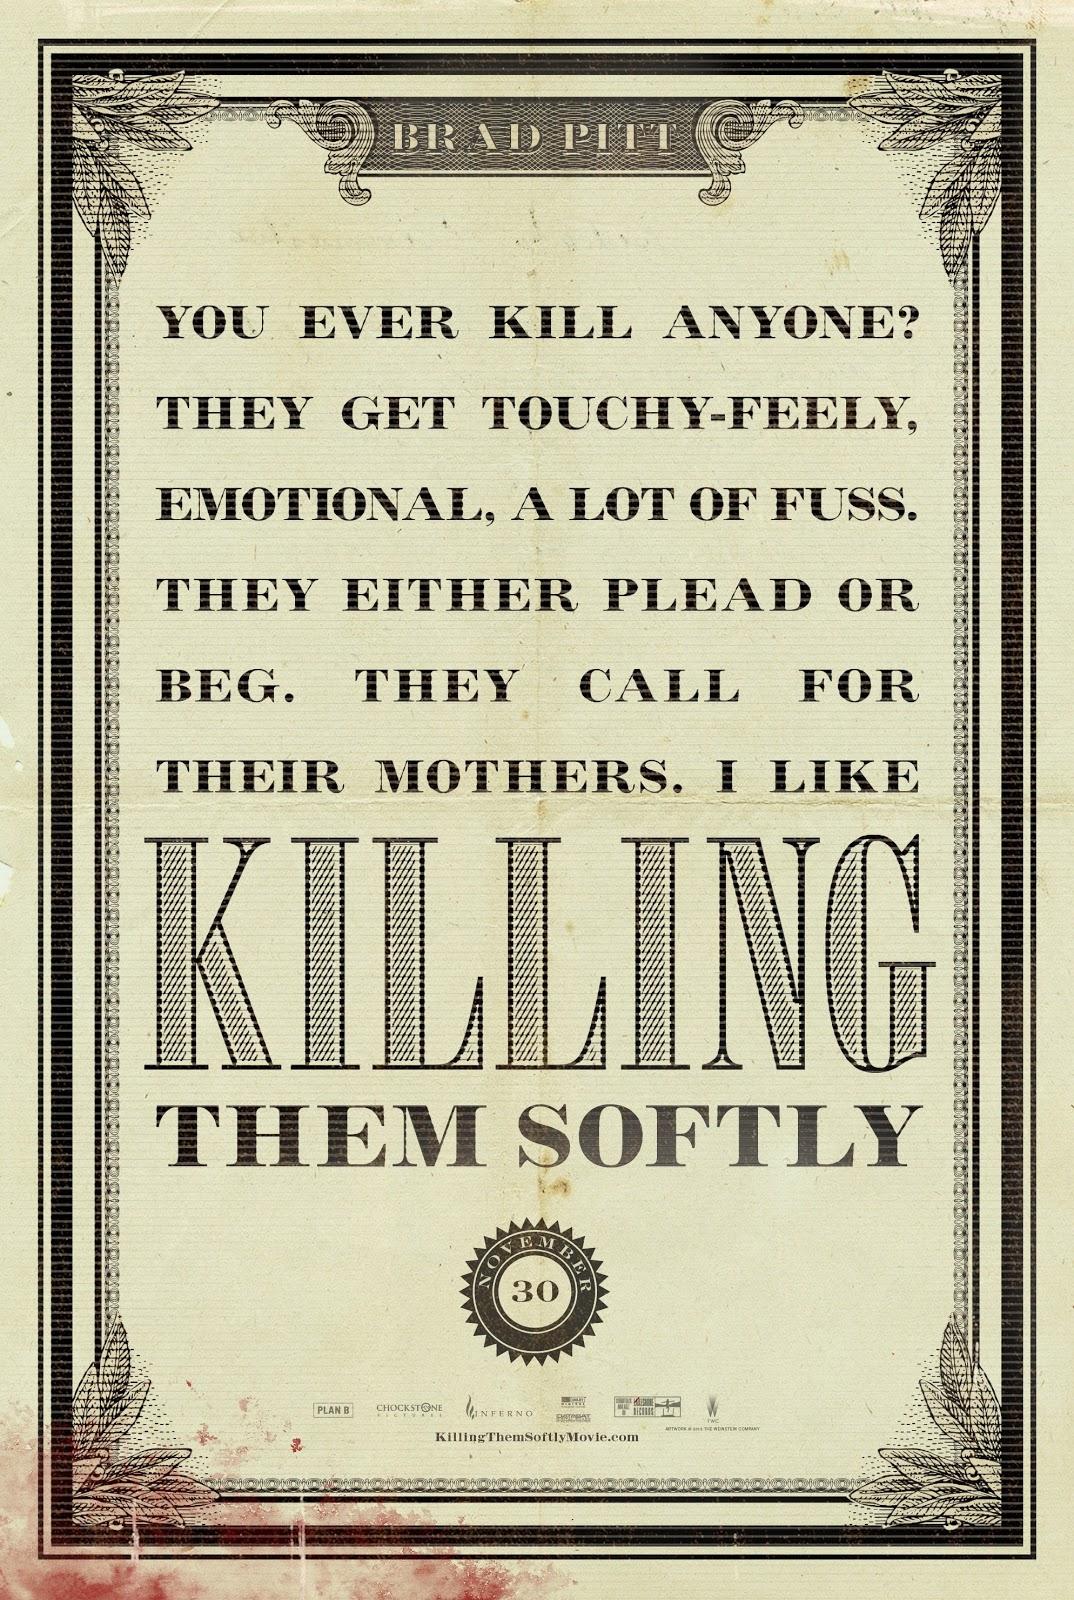 http://3.bp.blogspot.com/-6_HcL6tsKYs/UHRkDLYMhdI/AAAAAAAANzg/i2v_XzmJY3o/s1600/killing_them_softly_ver5_xxlg.jpg